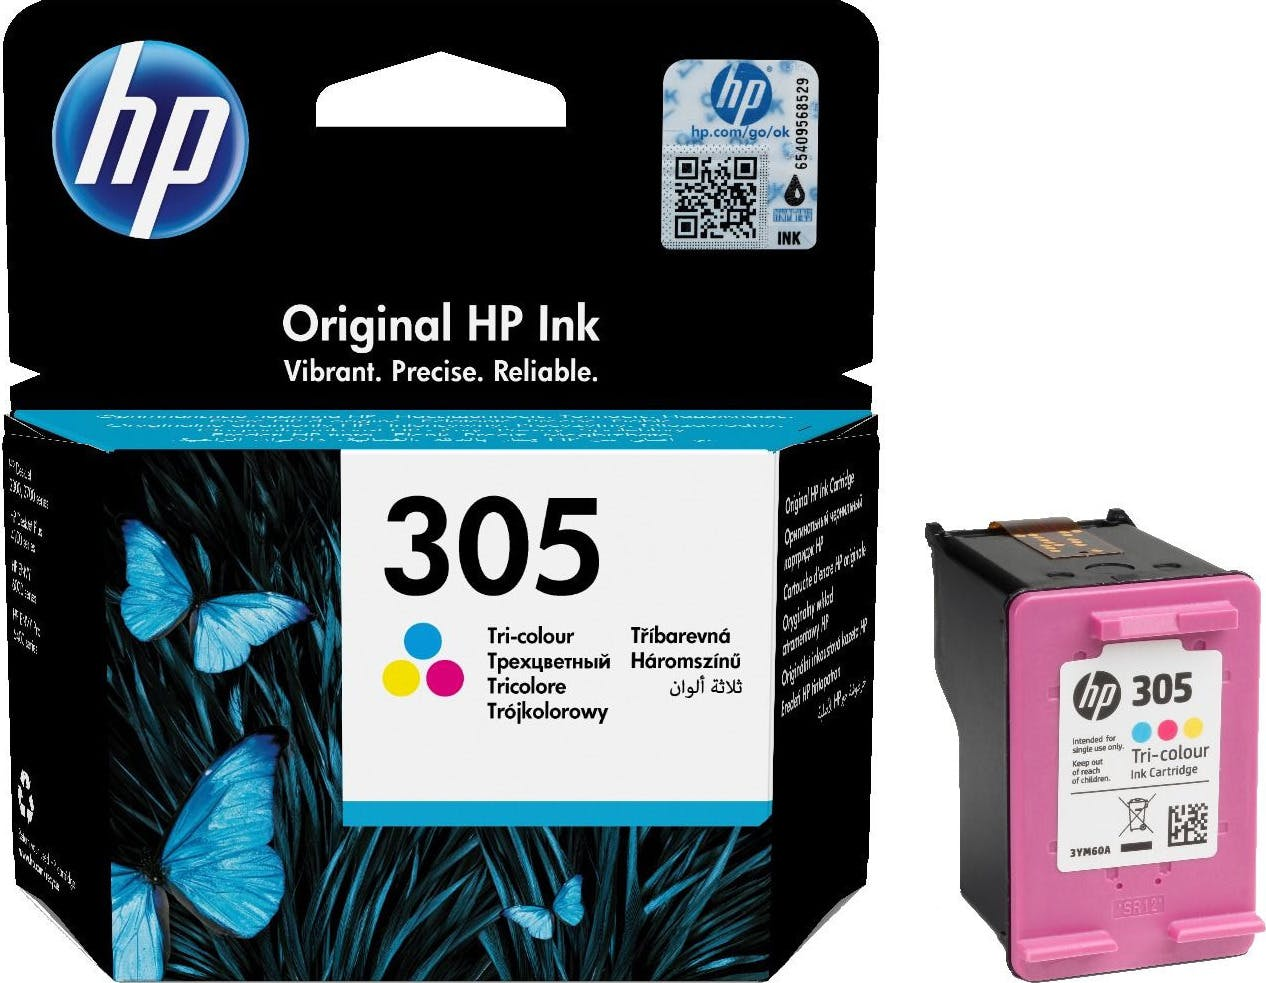 3YM60AE ink cartridge 3-colors No. 305 (3YM60AE ABE)